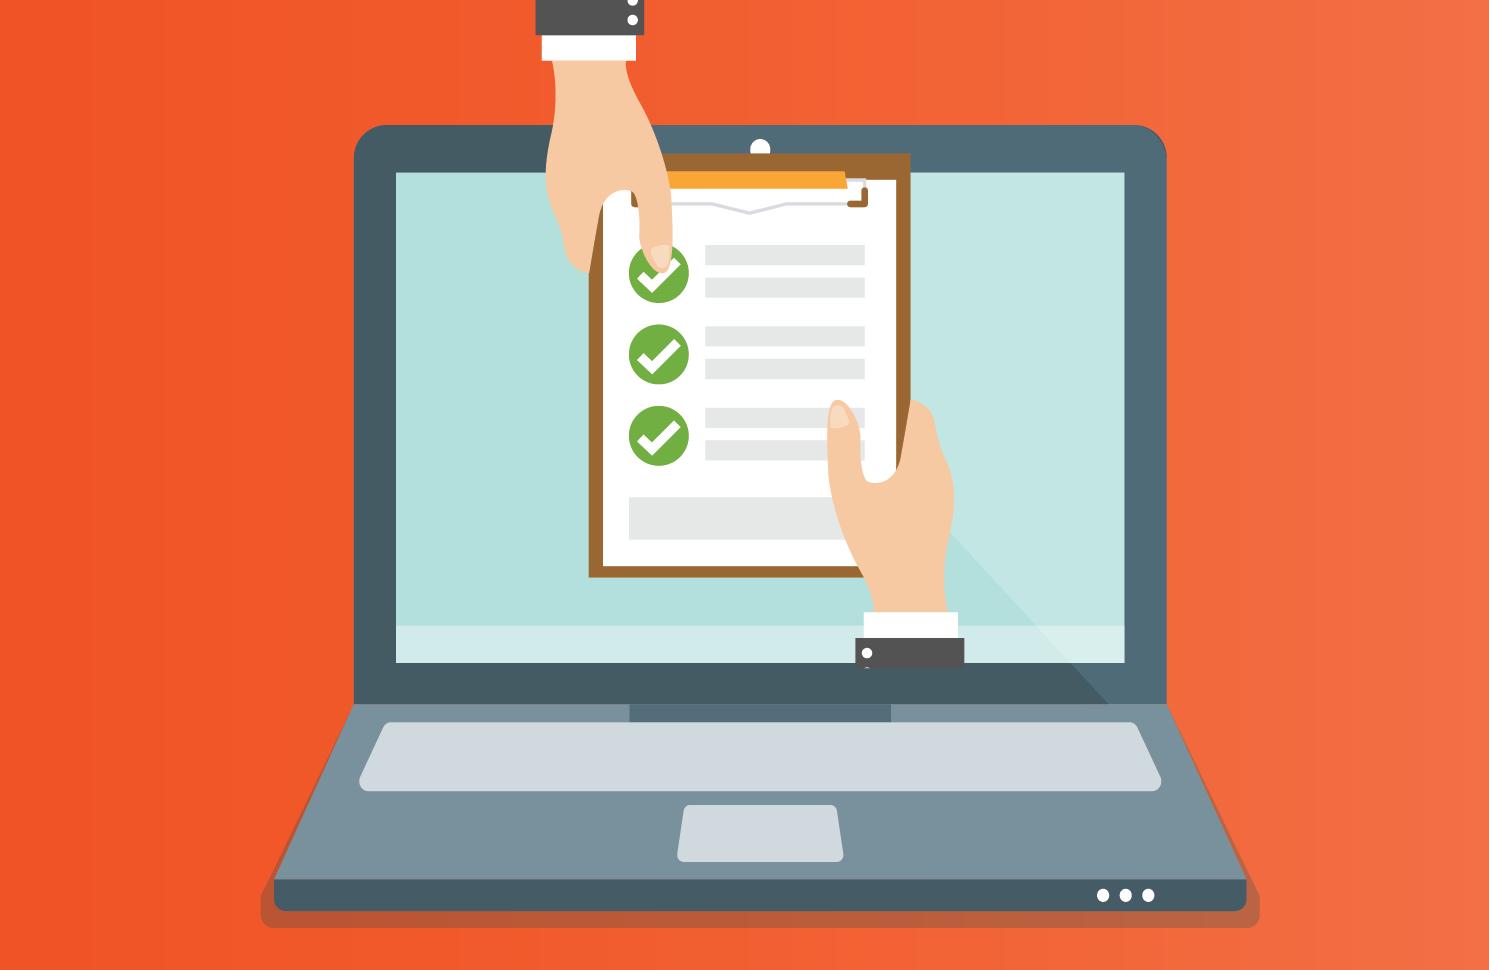 resources-webinar-vendor-management-policy-and-program-10-10-17